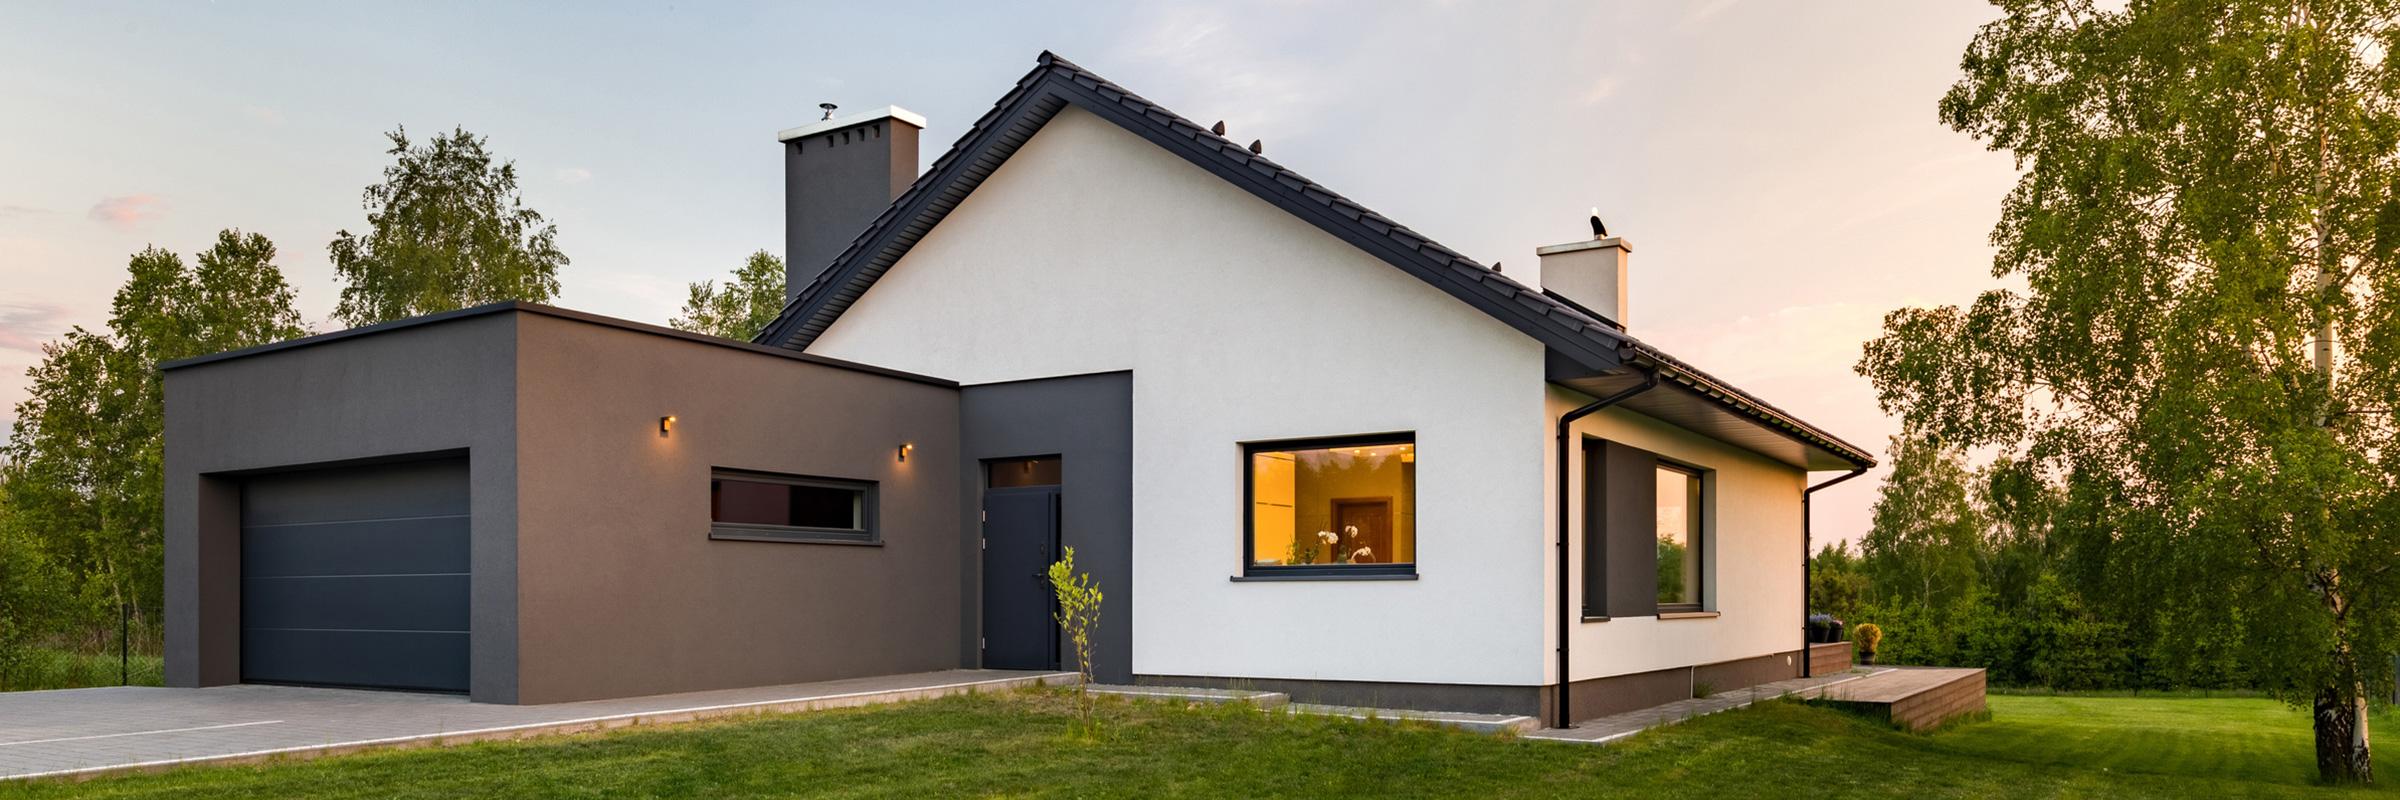 Startseiten Bild Haus